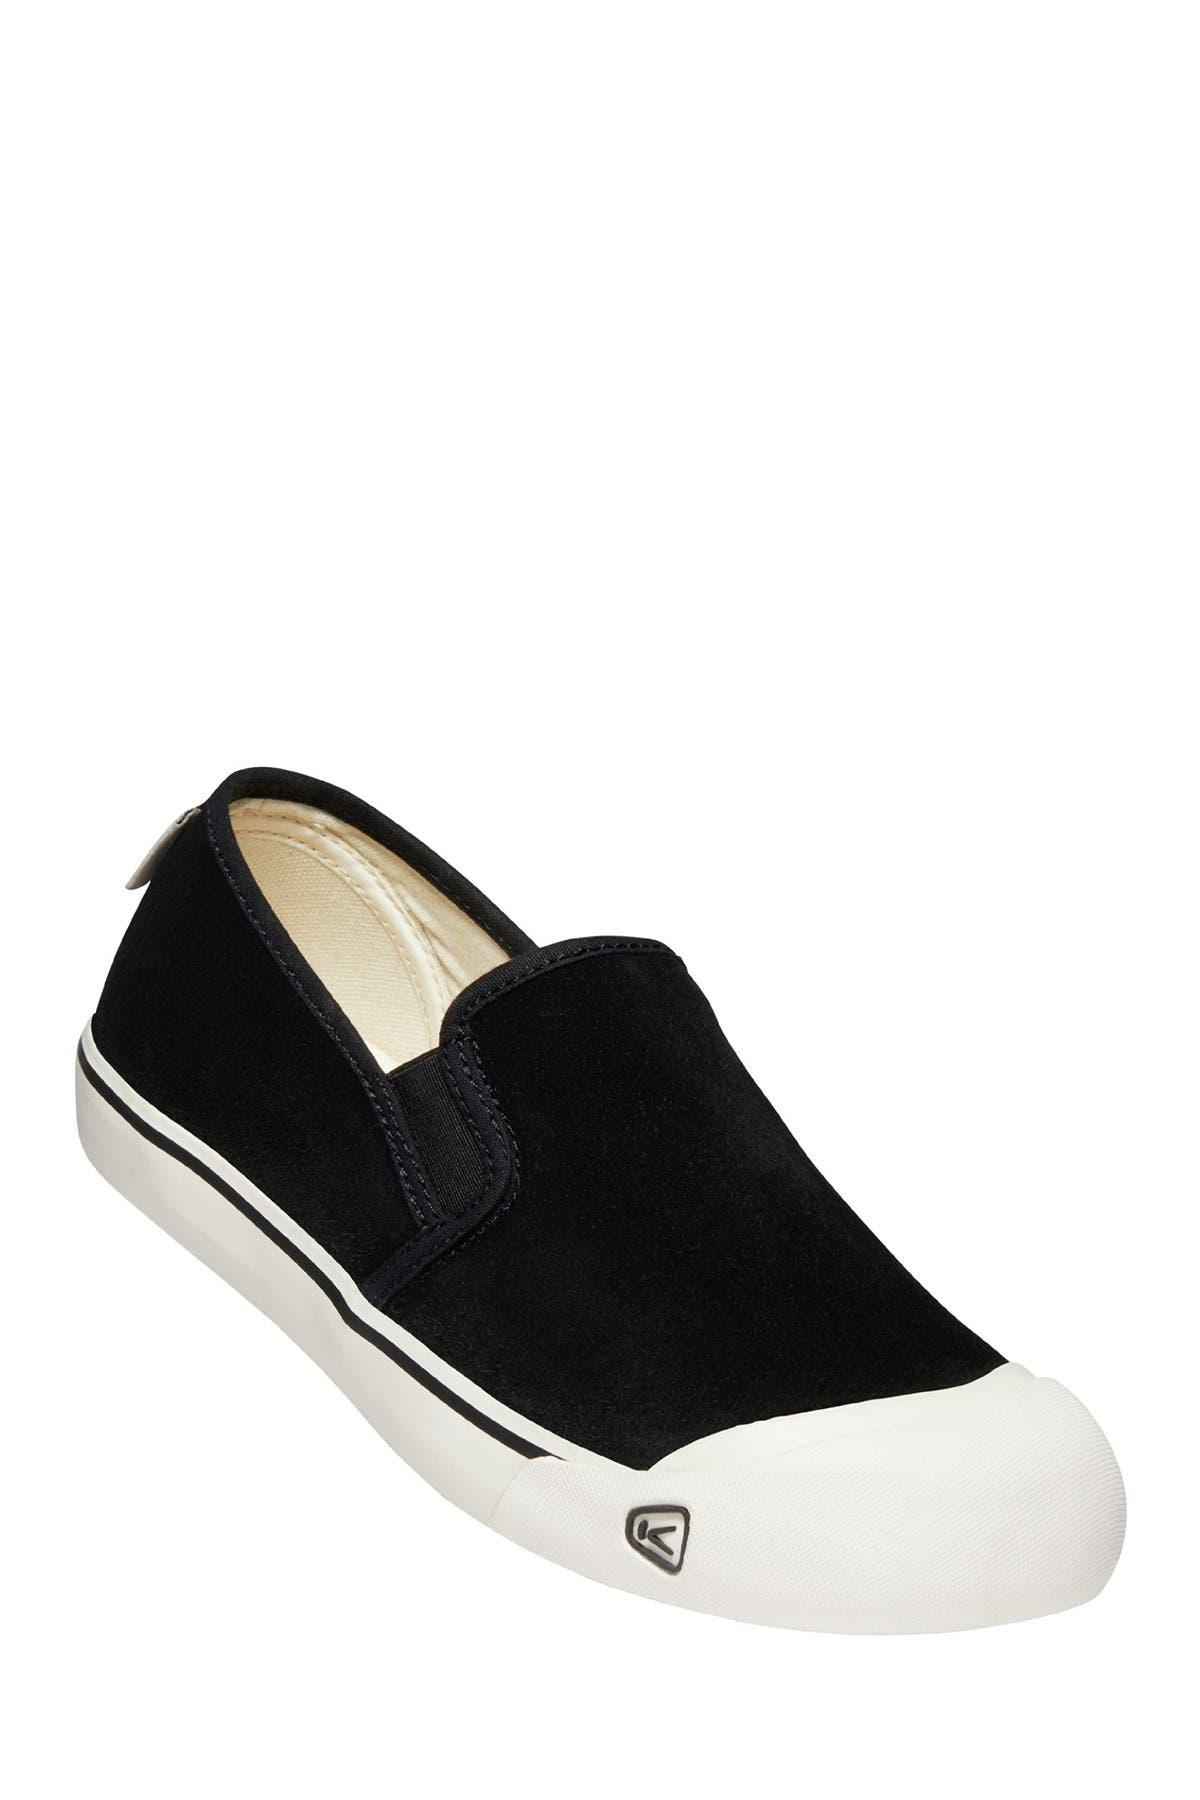 Image of Keen Coronado III Slip-On Suede Sneaker